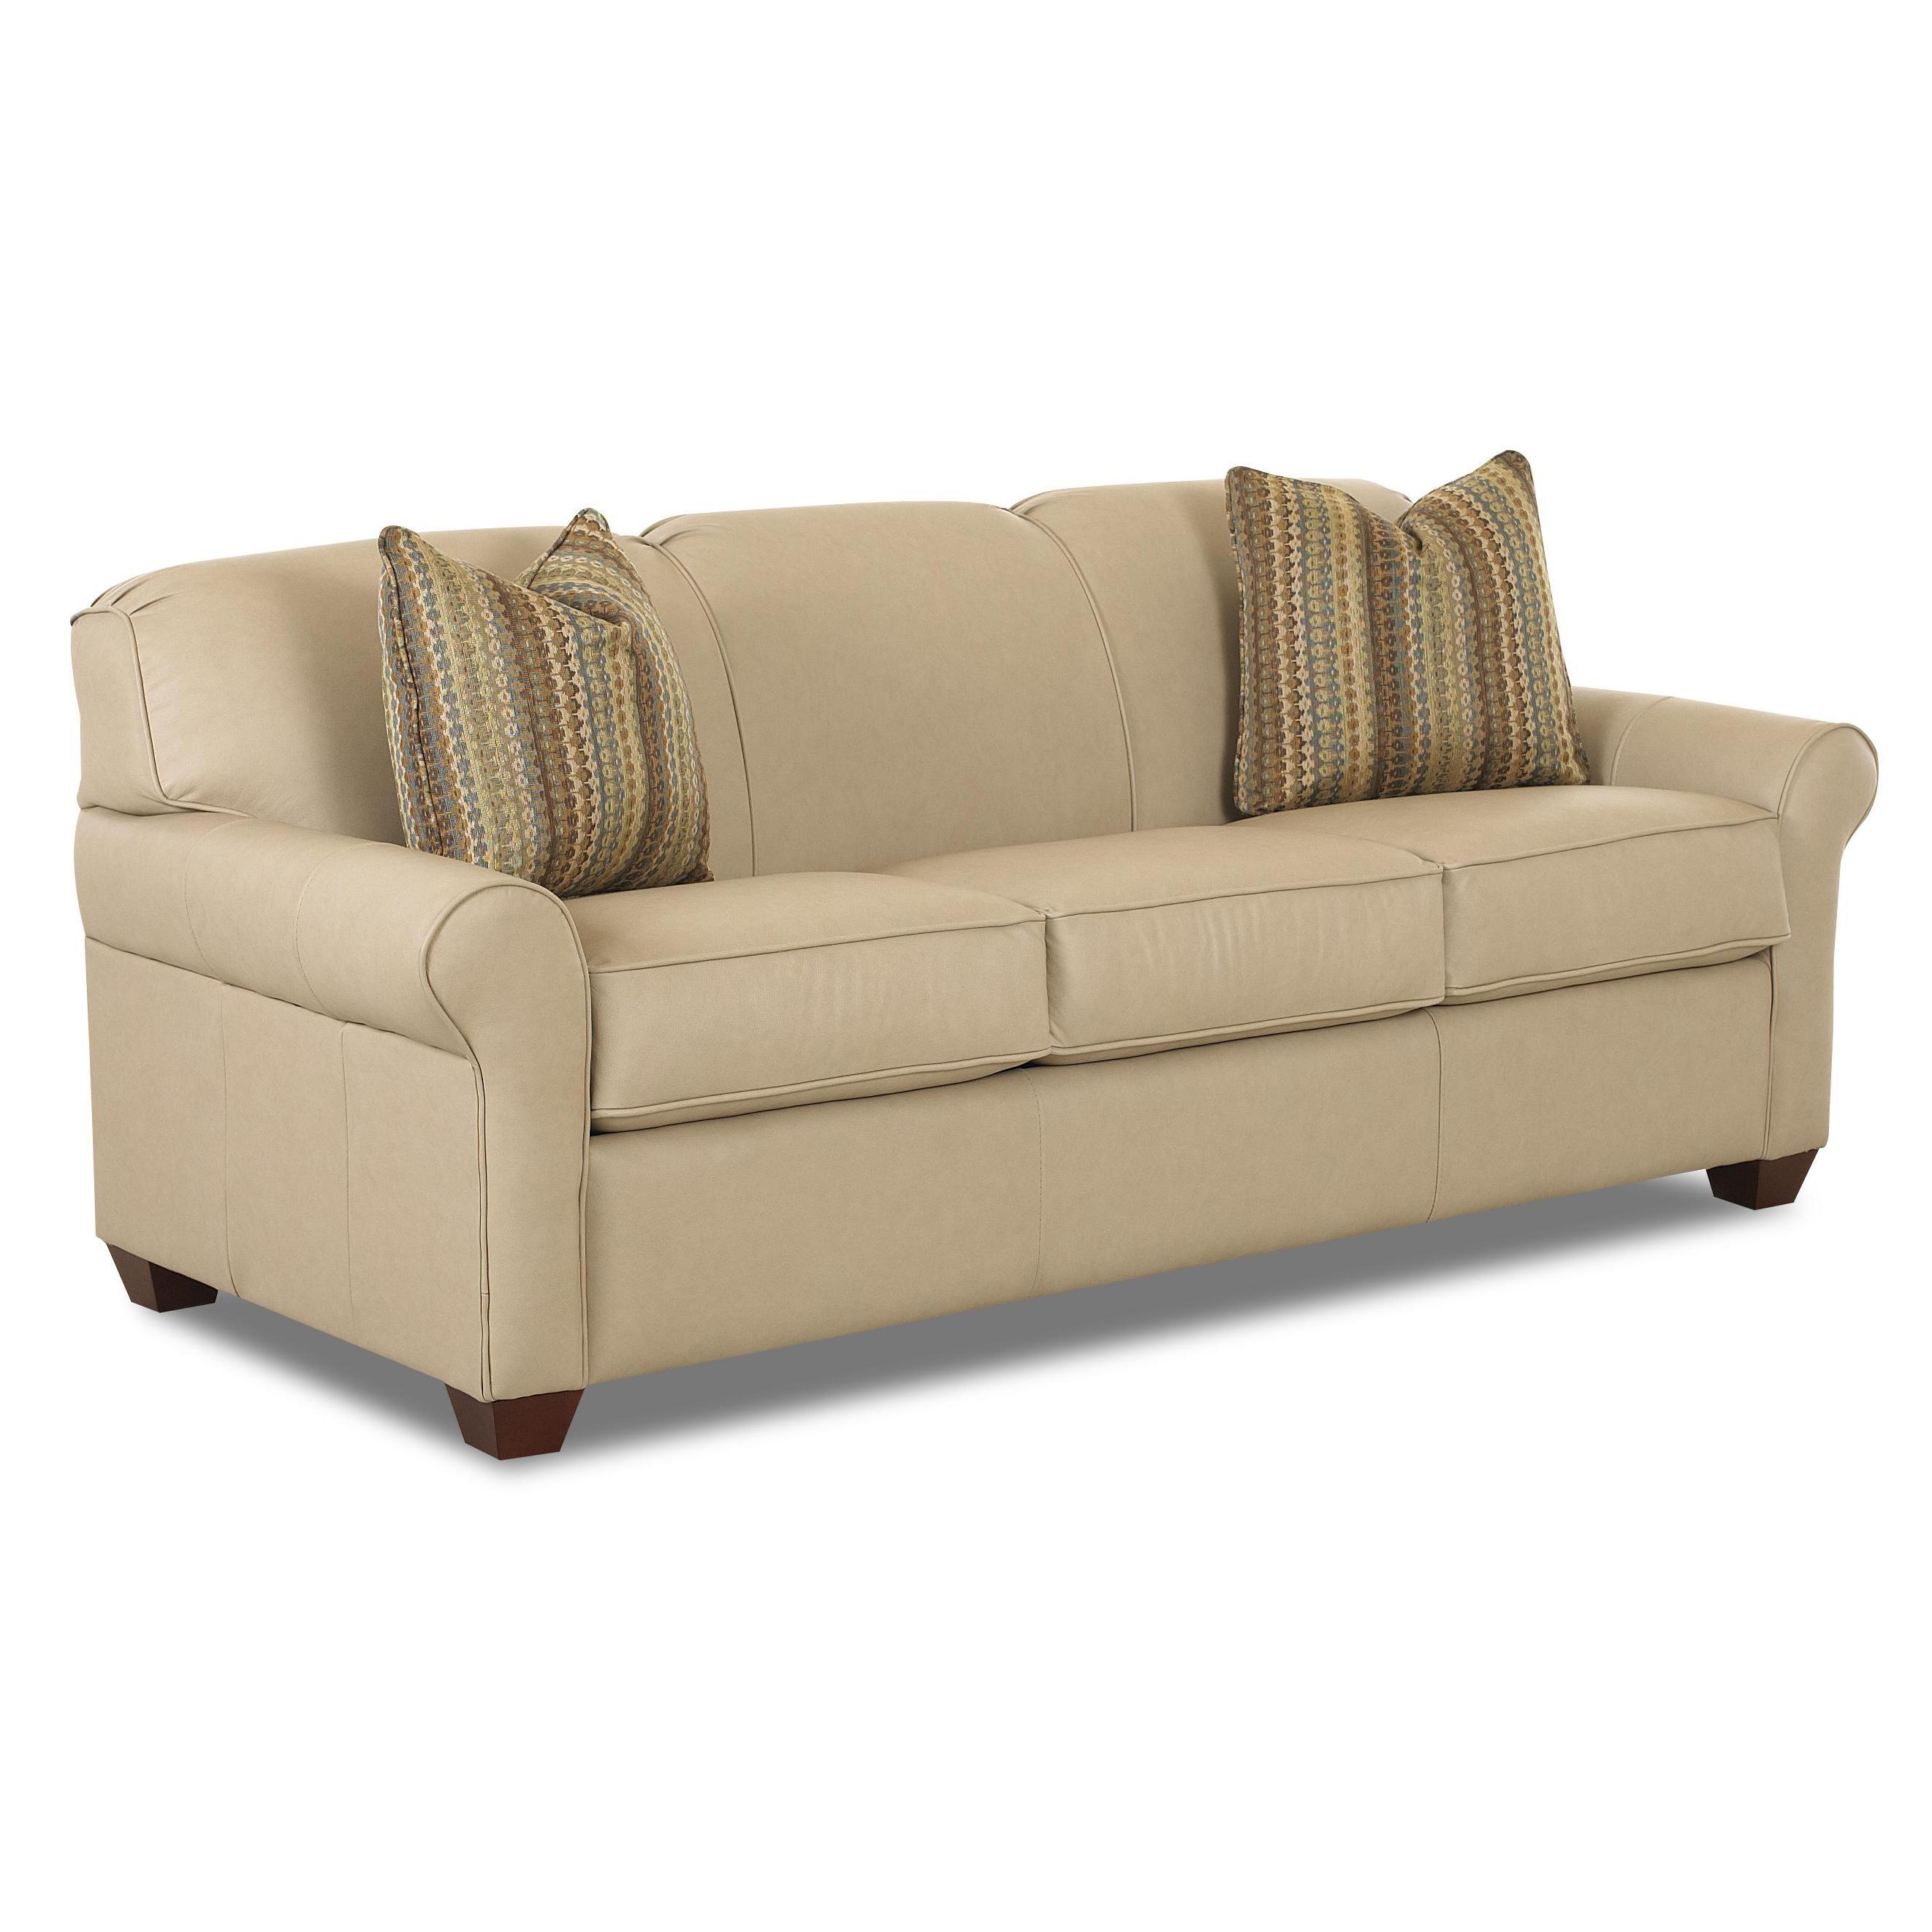 Klaussner Mayhew 97900 Iqsl Innerspring Queen Sleeper Sofa